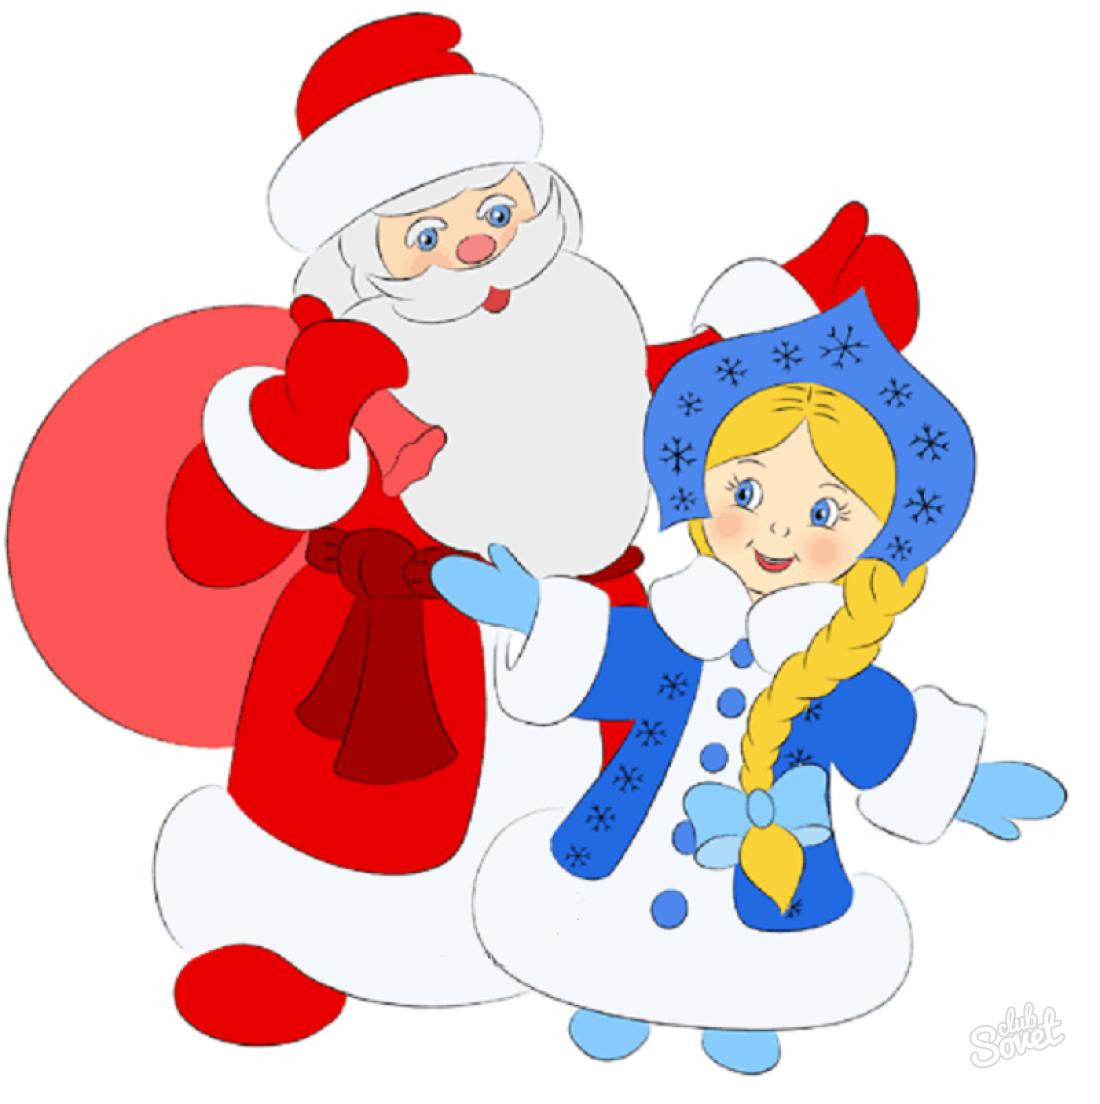 Нарисовать картинки деда мороза и снегурочки